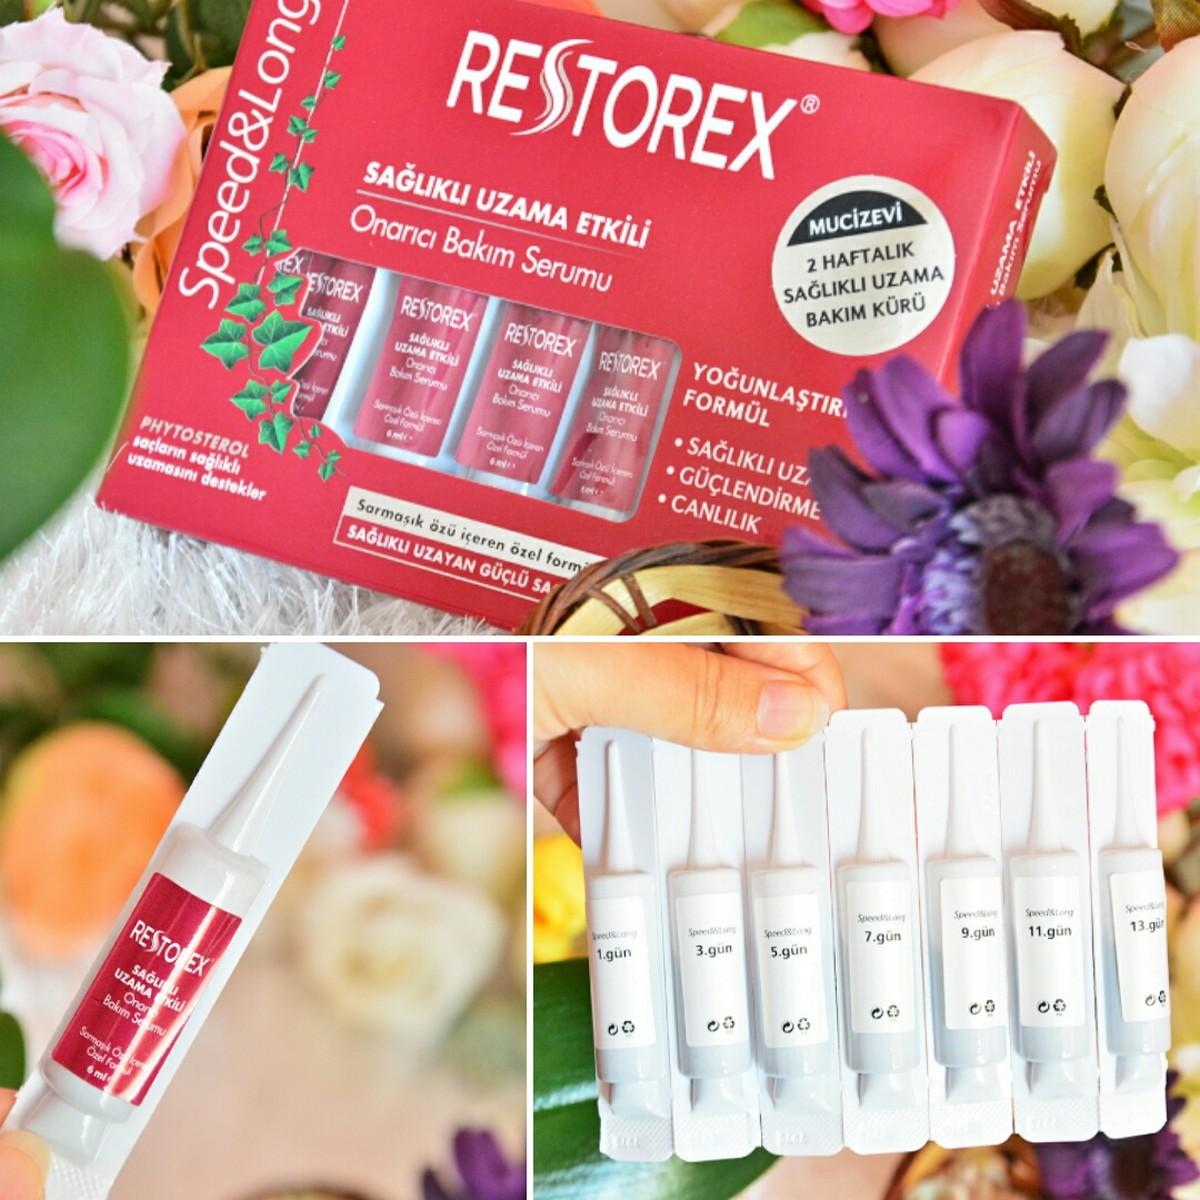 Restorex Serum Kullananlar